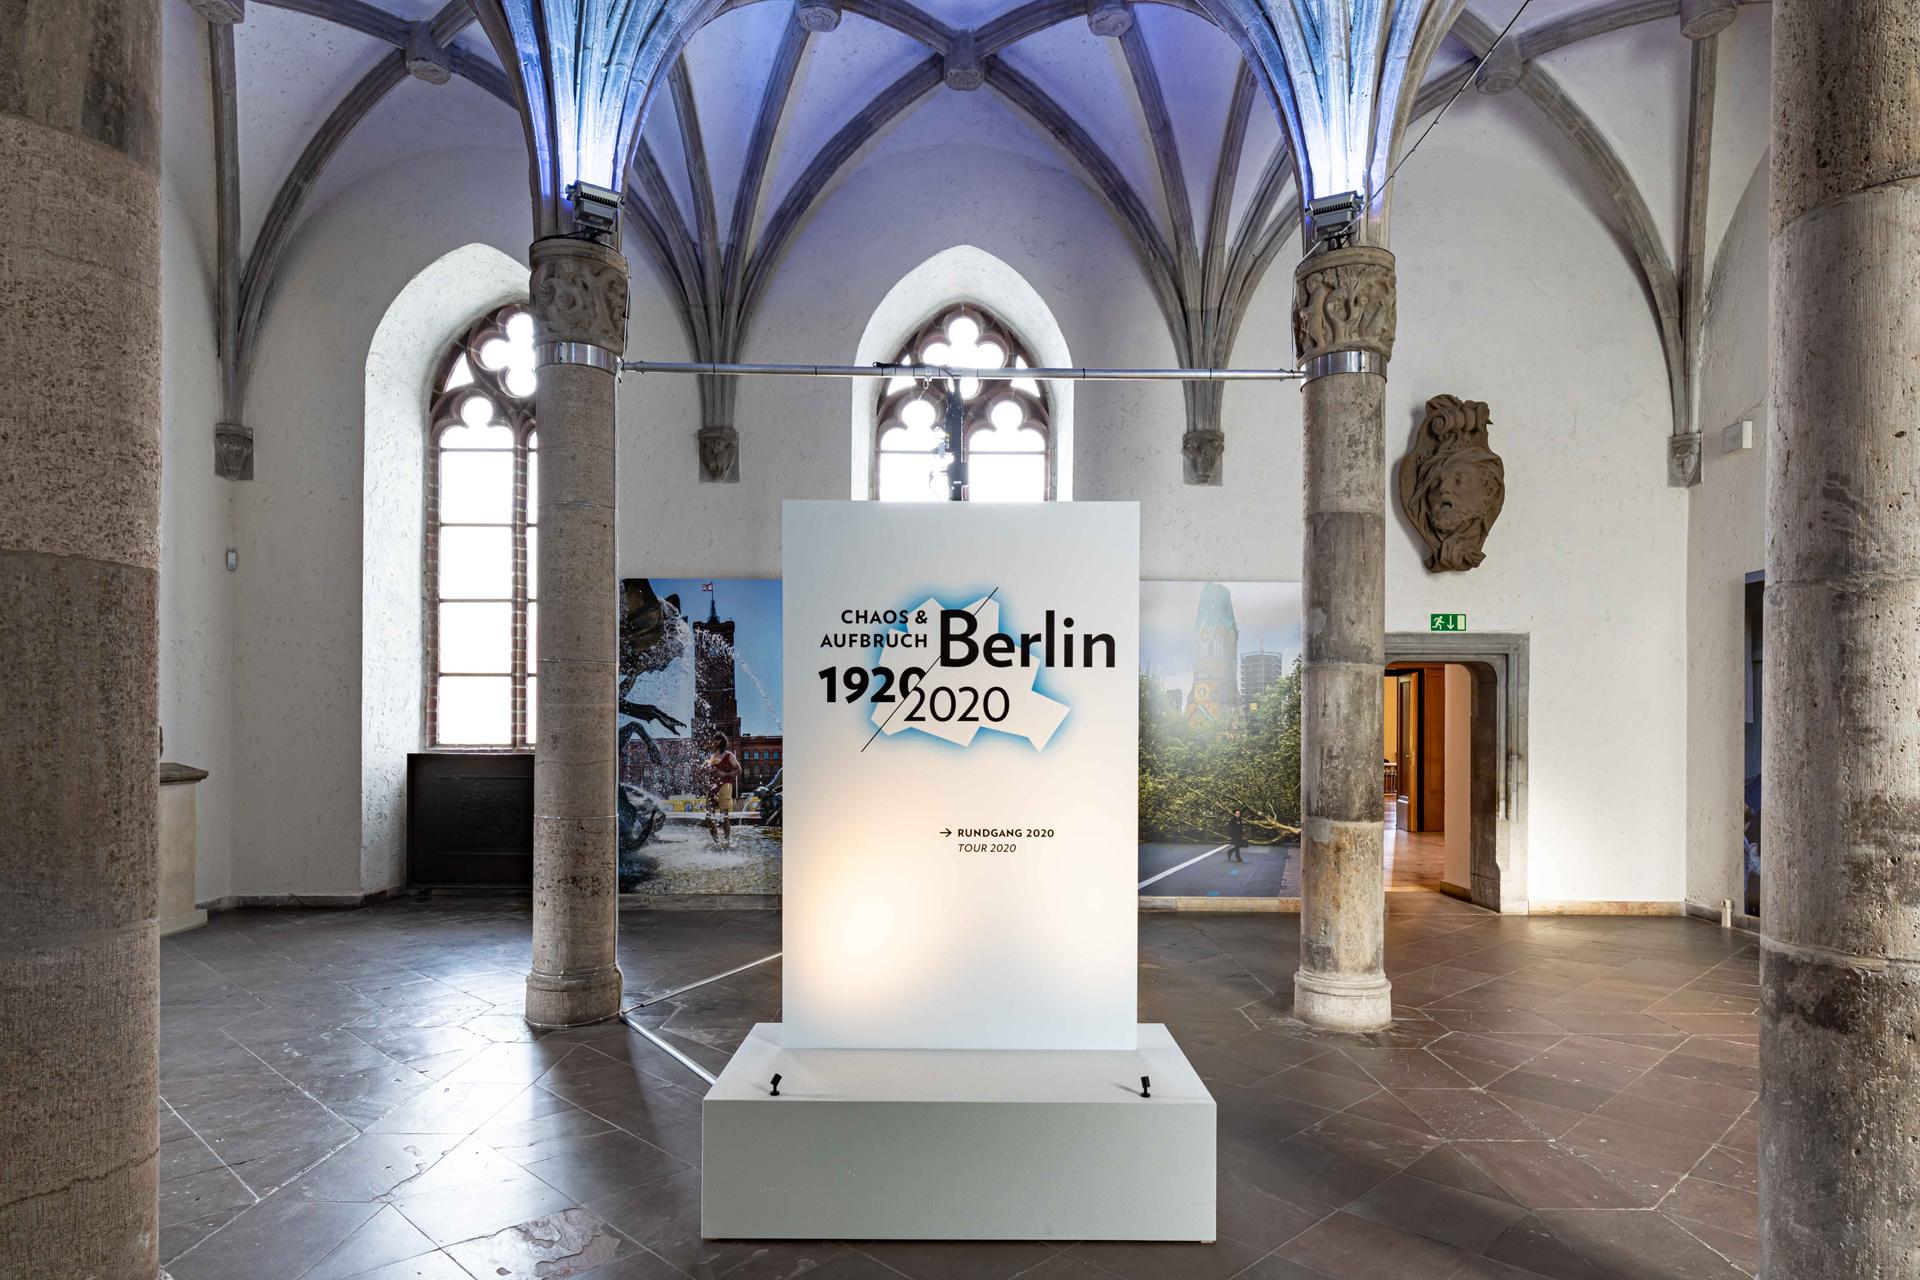 CHAOS & RENEWAL – BERLIN 1920/2020